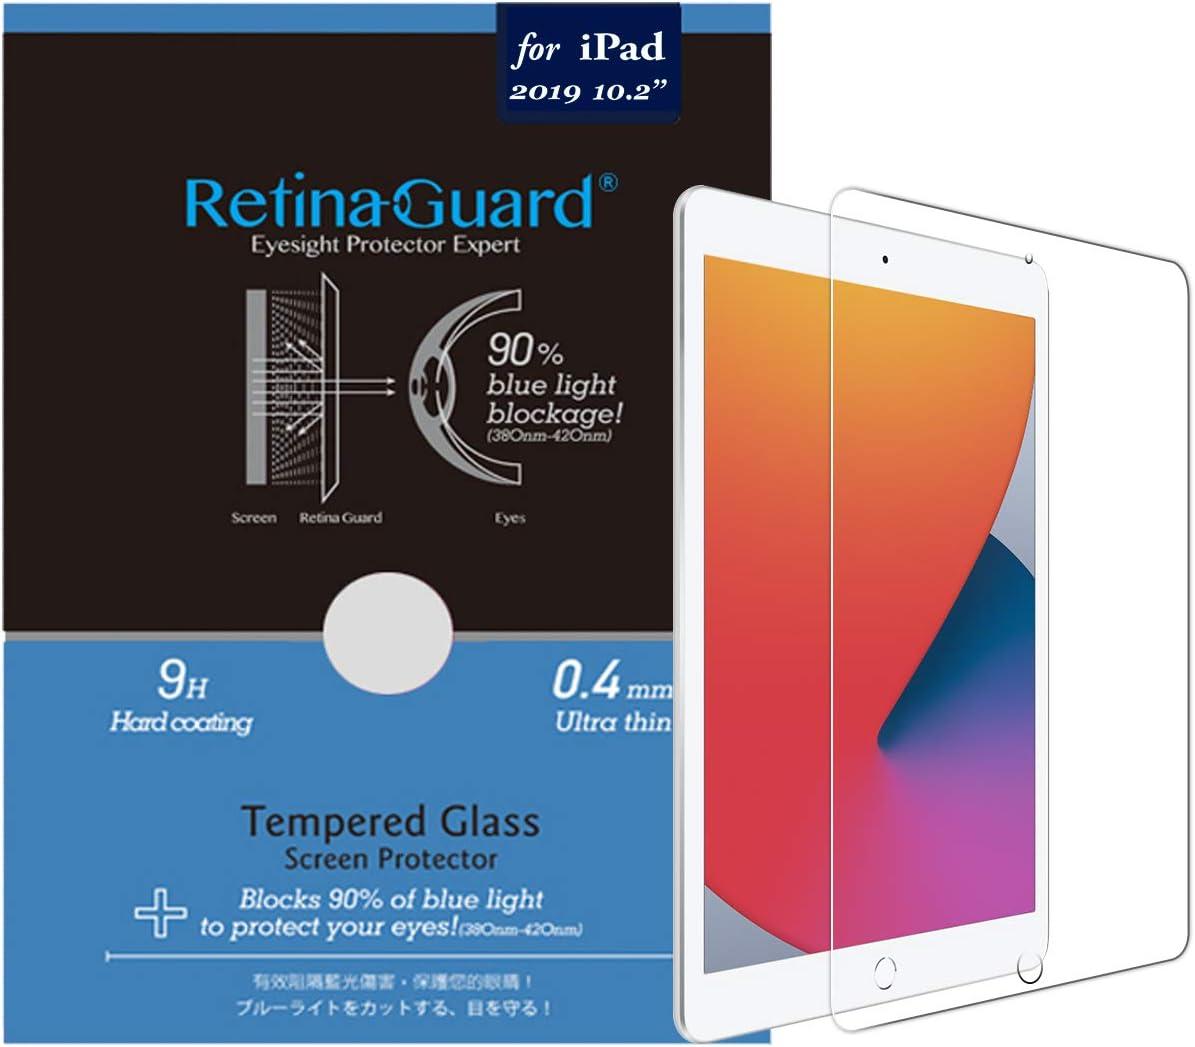 RetinaGuard Anti Blue Light Tempered Glass Screen Protector for 2020 iPad 8th Gen / 2019 iPad 7th Gen, SGS Tested, Blocks Excessive Harmful Blue Light